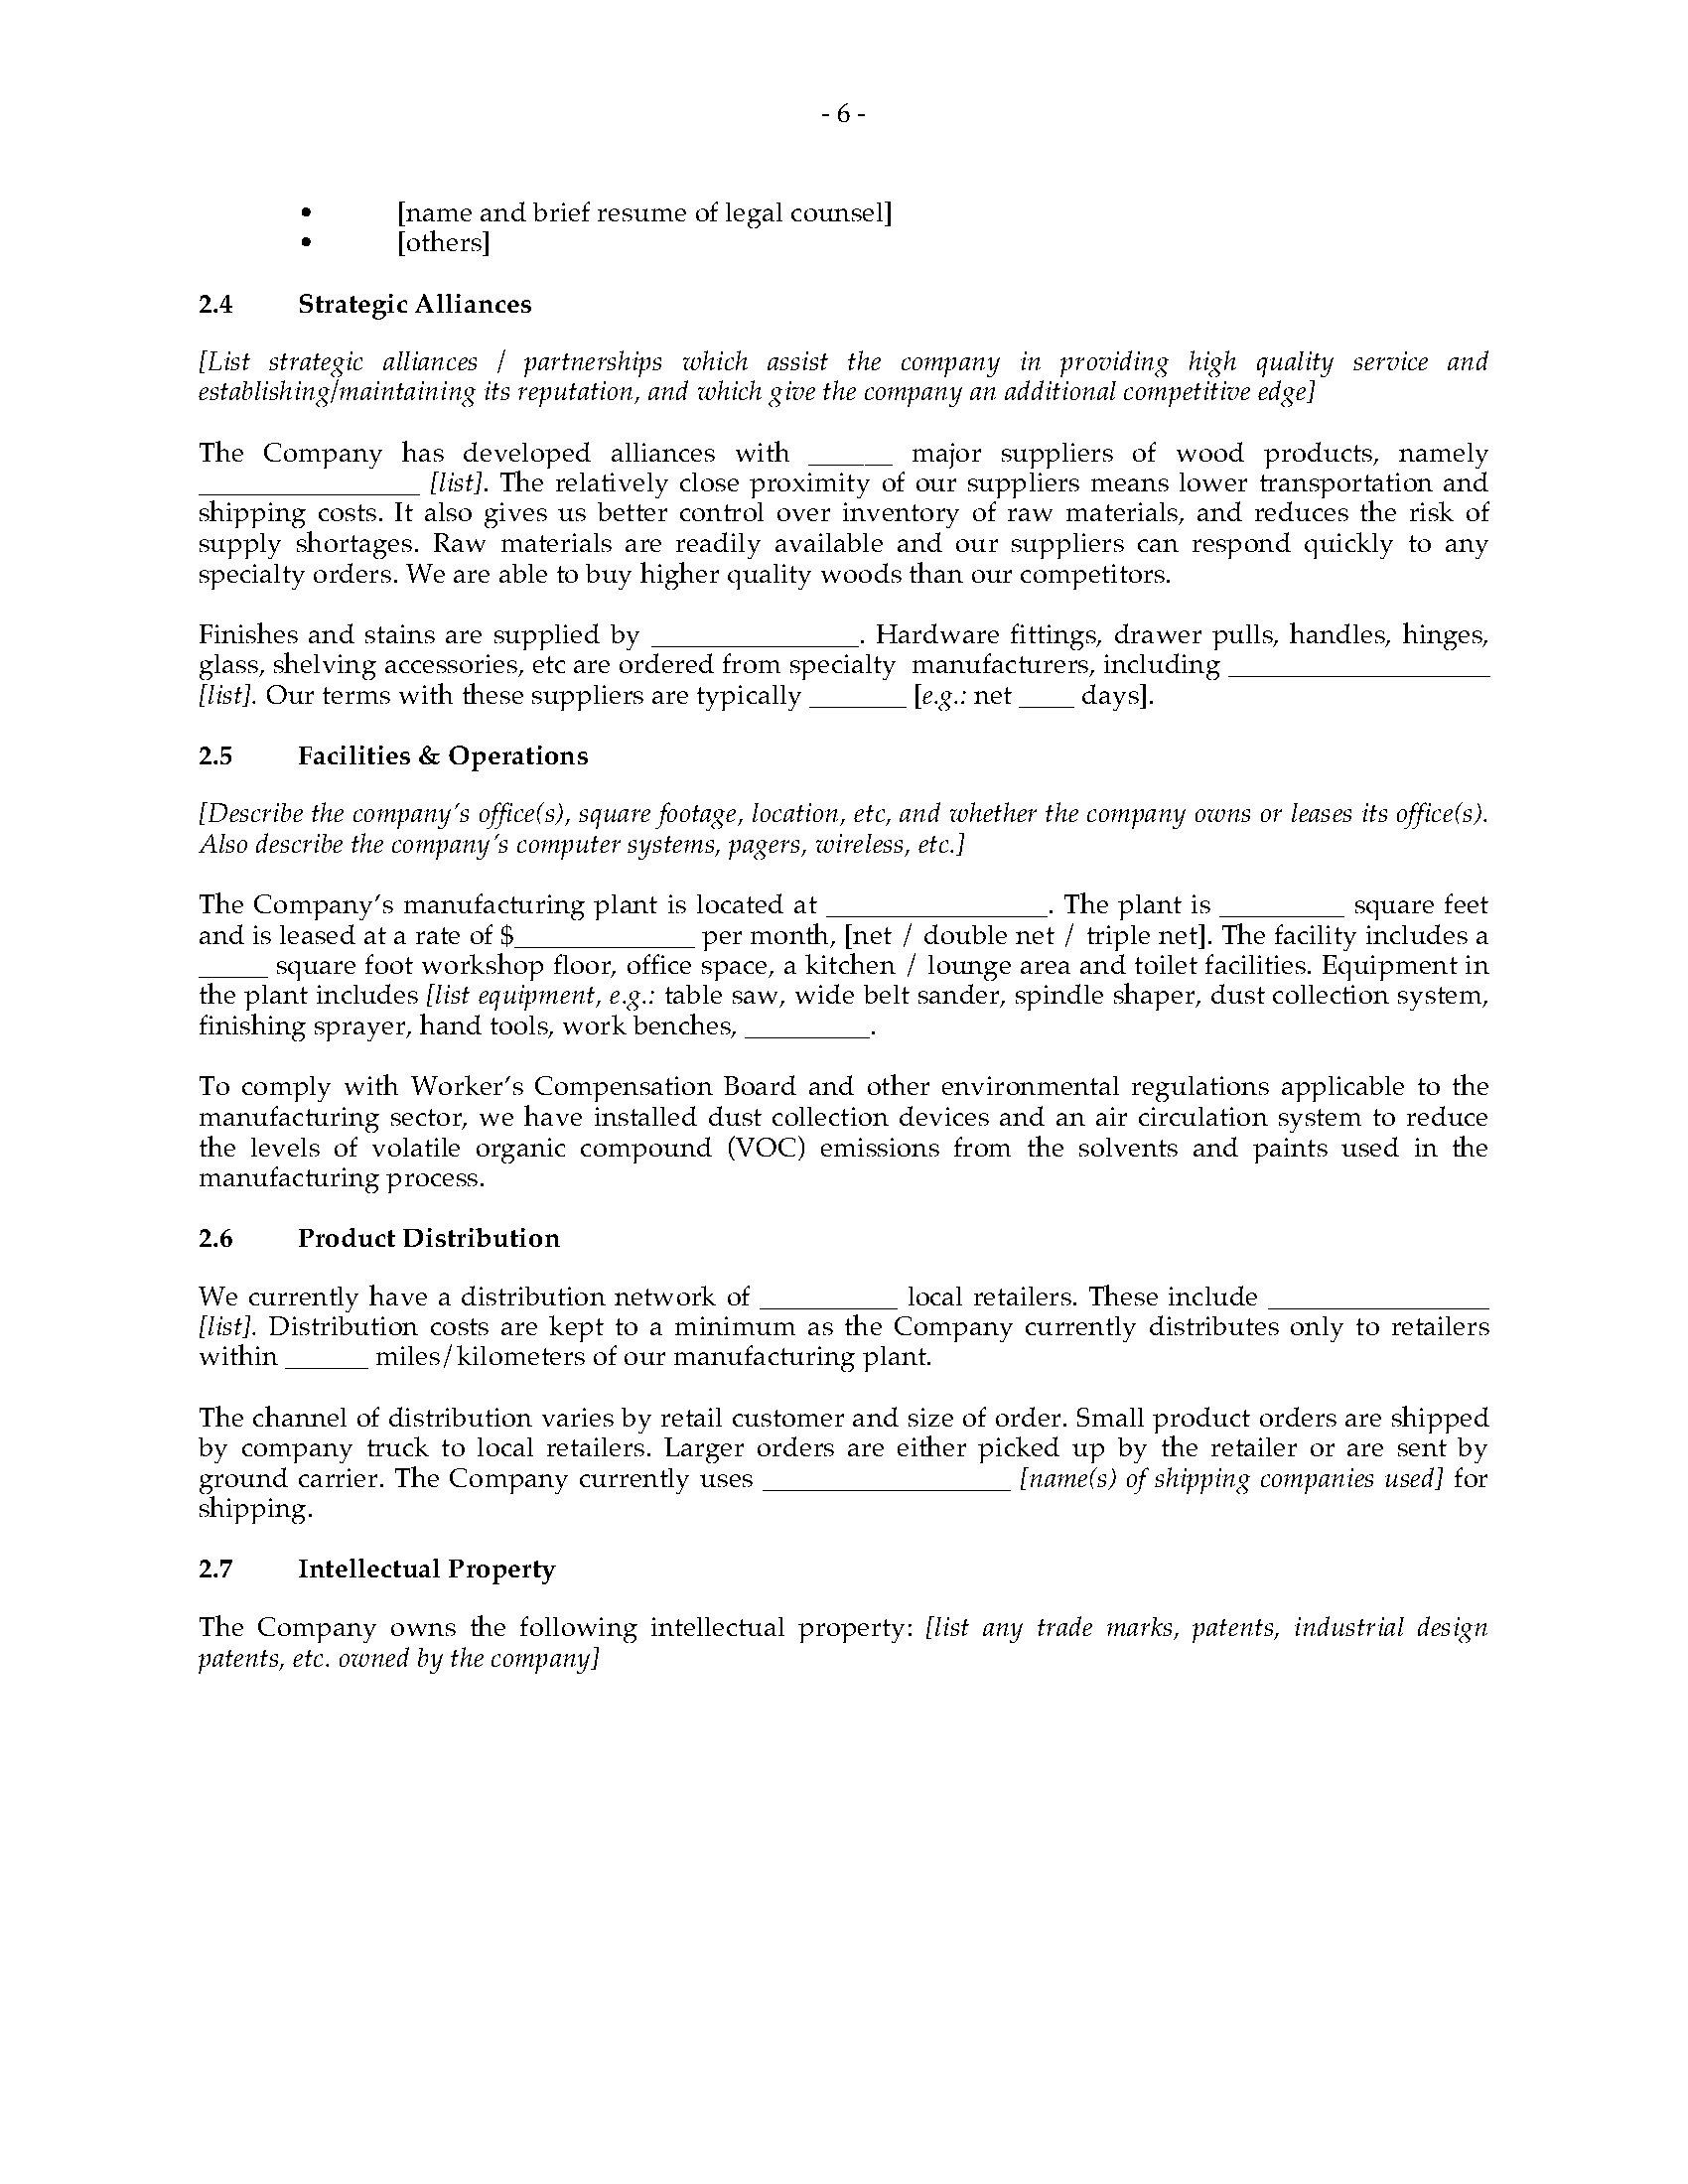 Furniture Manufacturer Business Plan